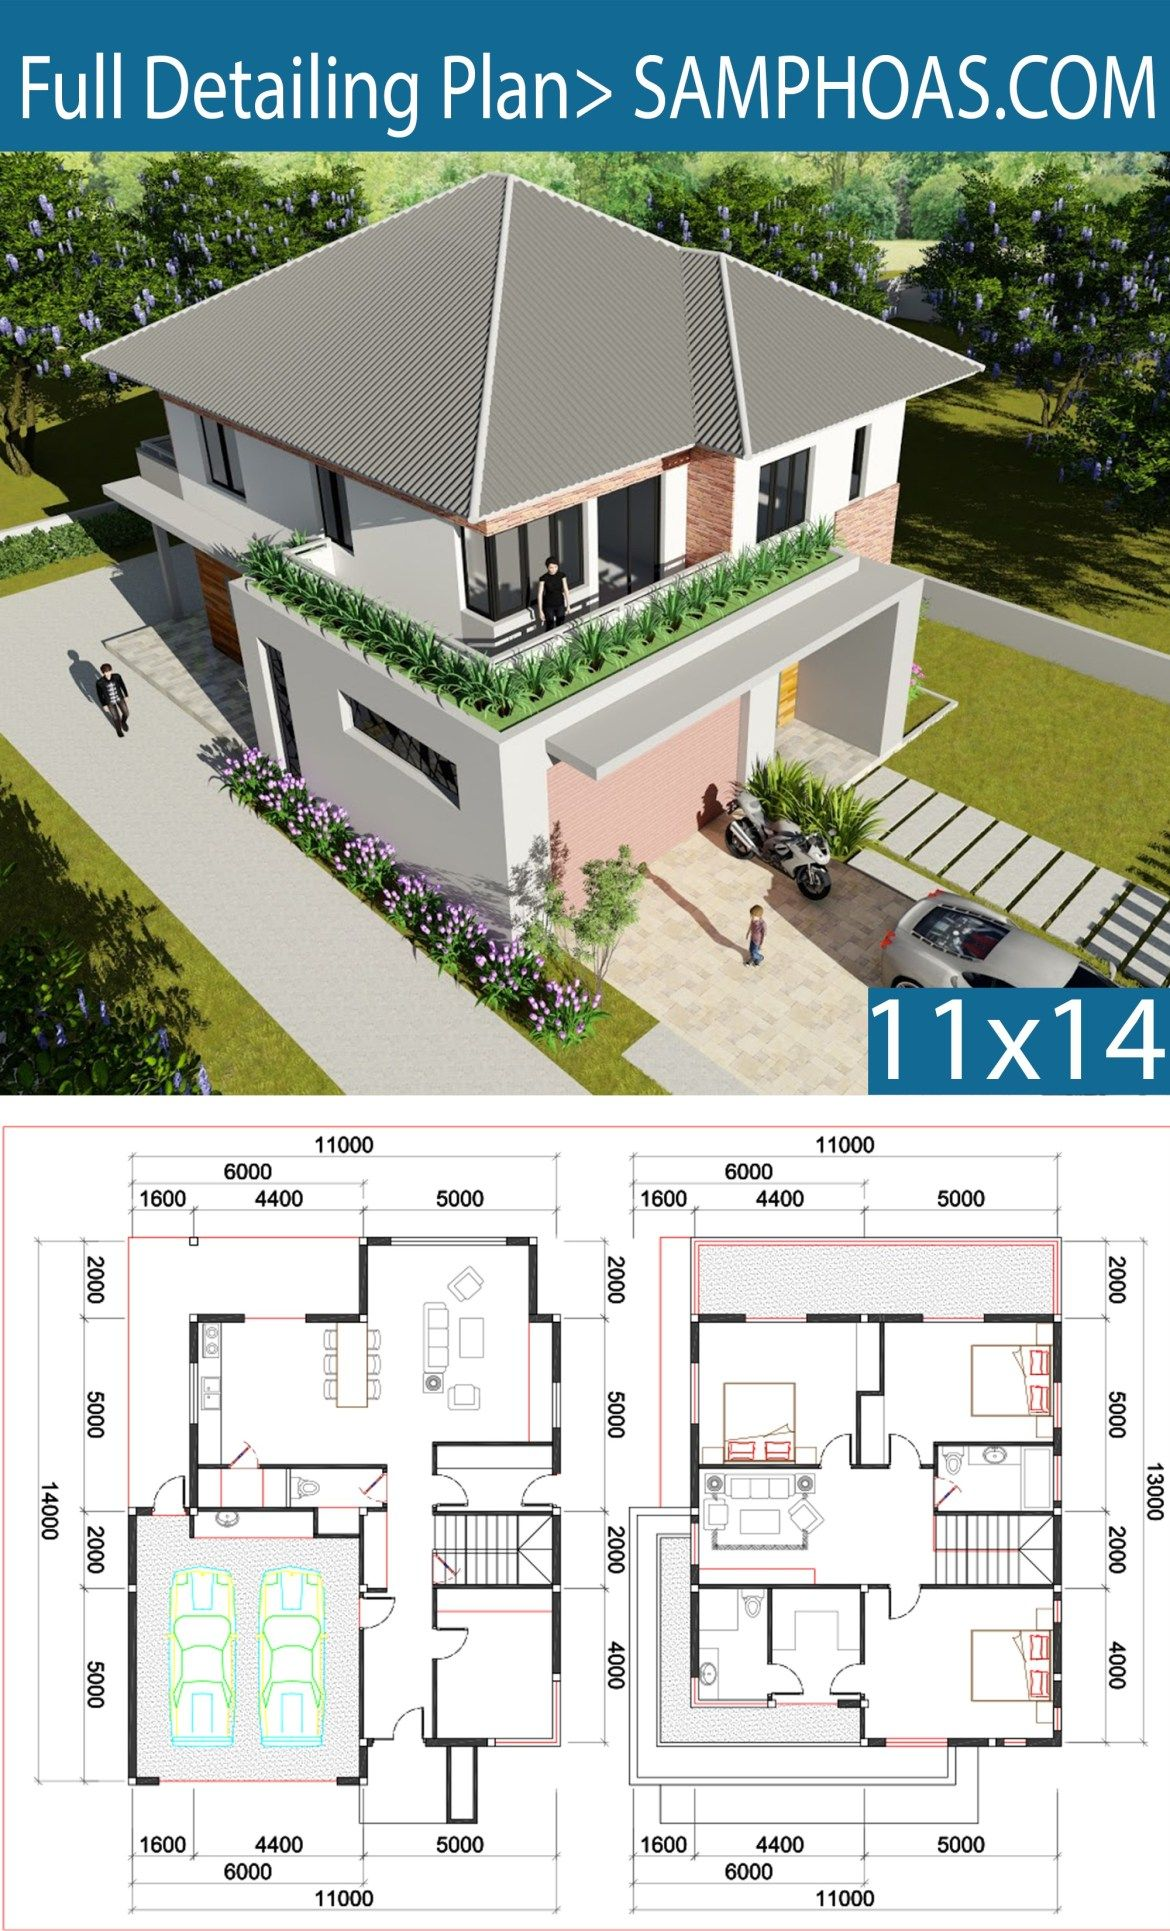 3 Bedroom Villa Design 11x13m Samphoas Plansearch Villa Design Home Design Floor Plans House Layouts